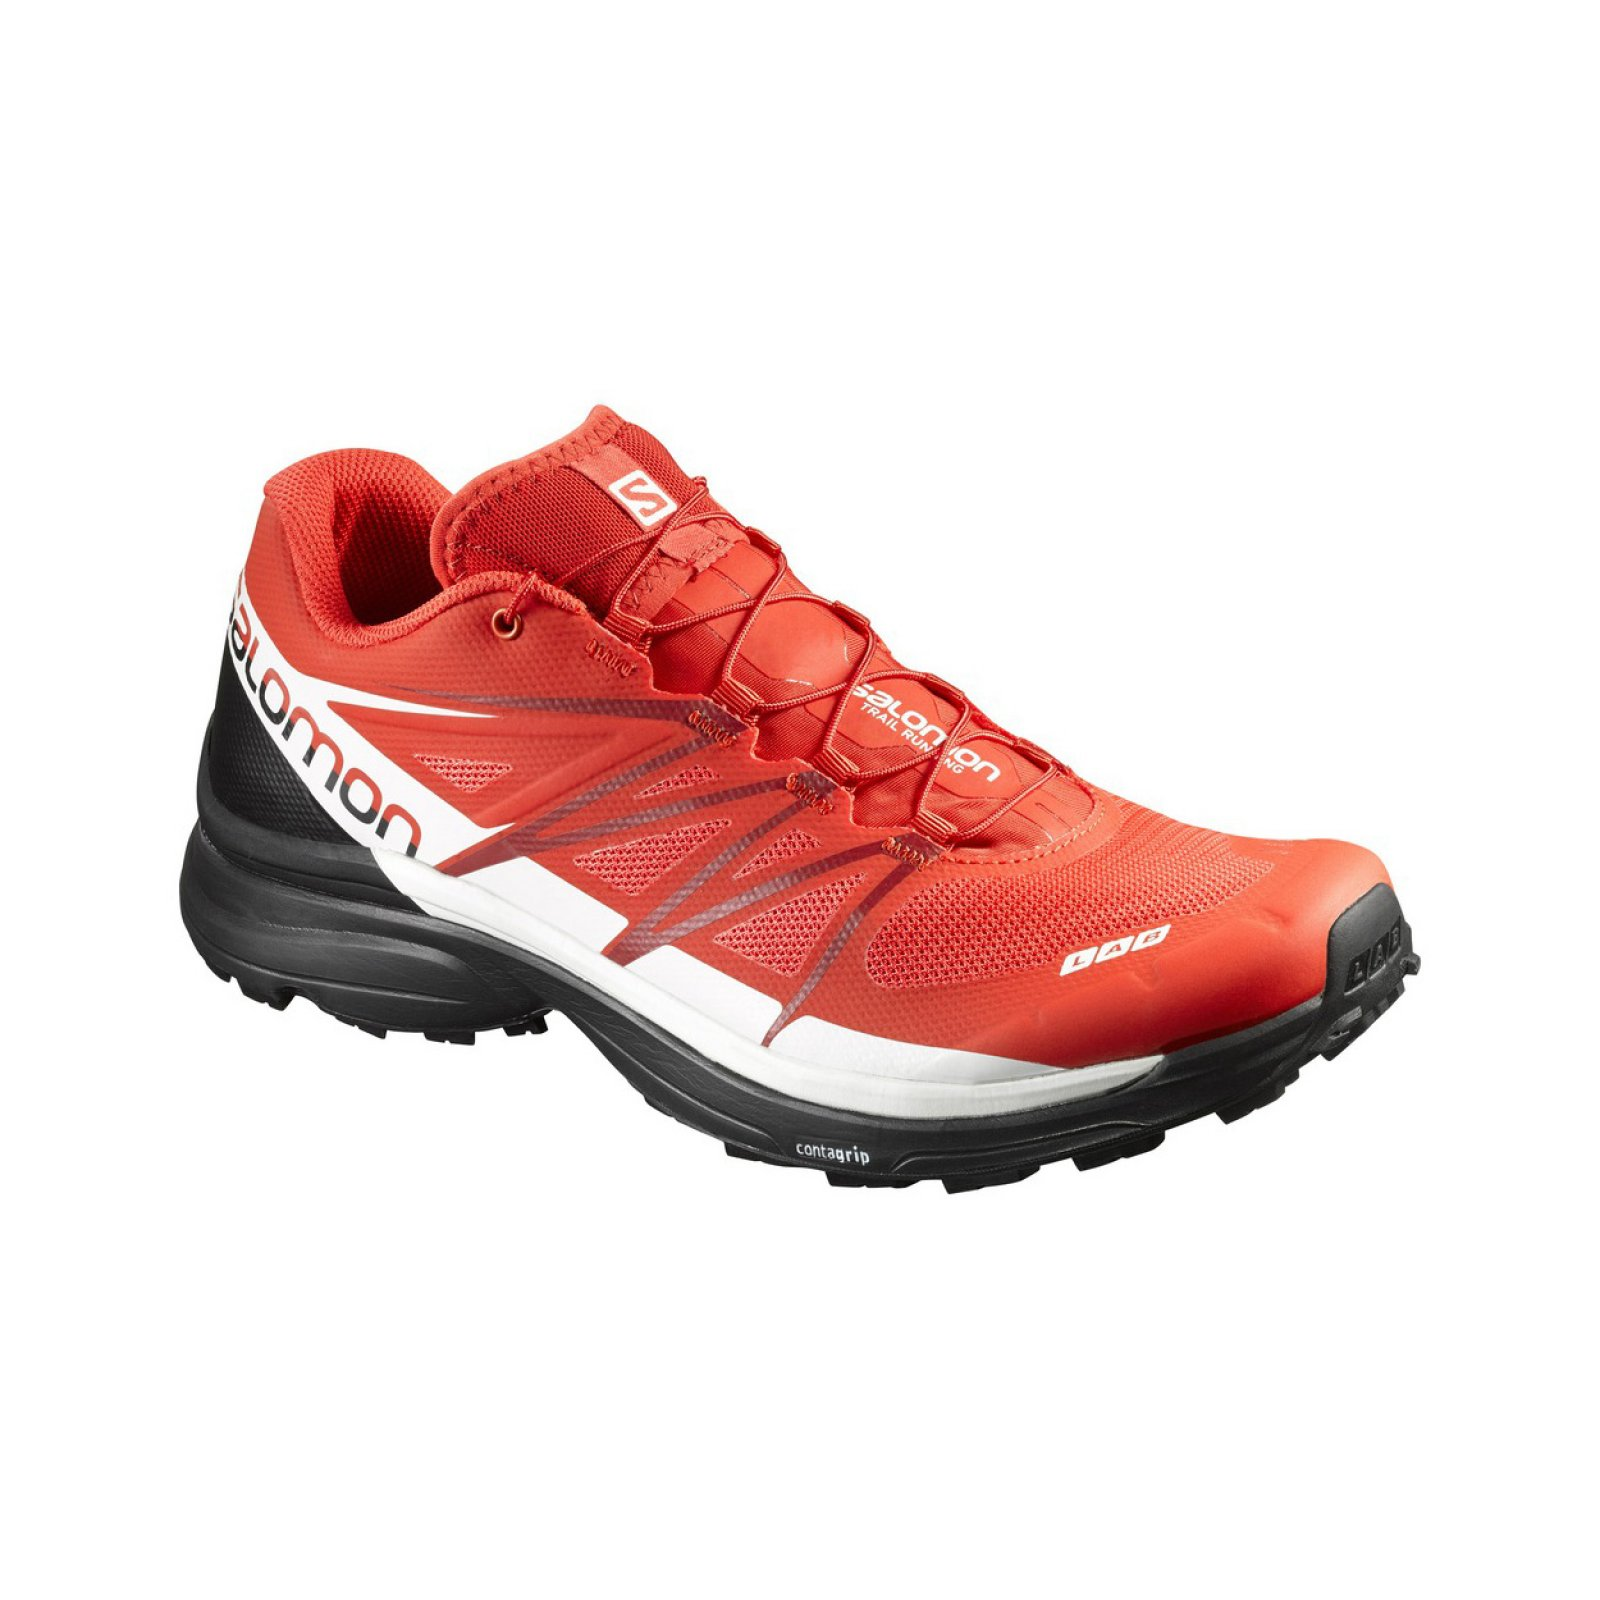 Trailové běžecké boty Salomon S-LAB Wings 8 L39121500 - Actisport.cz 6248019fa22